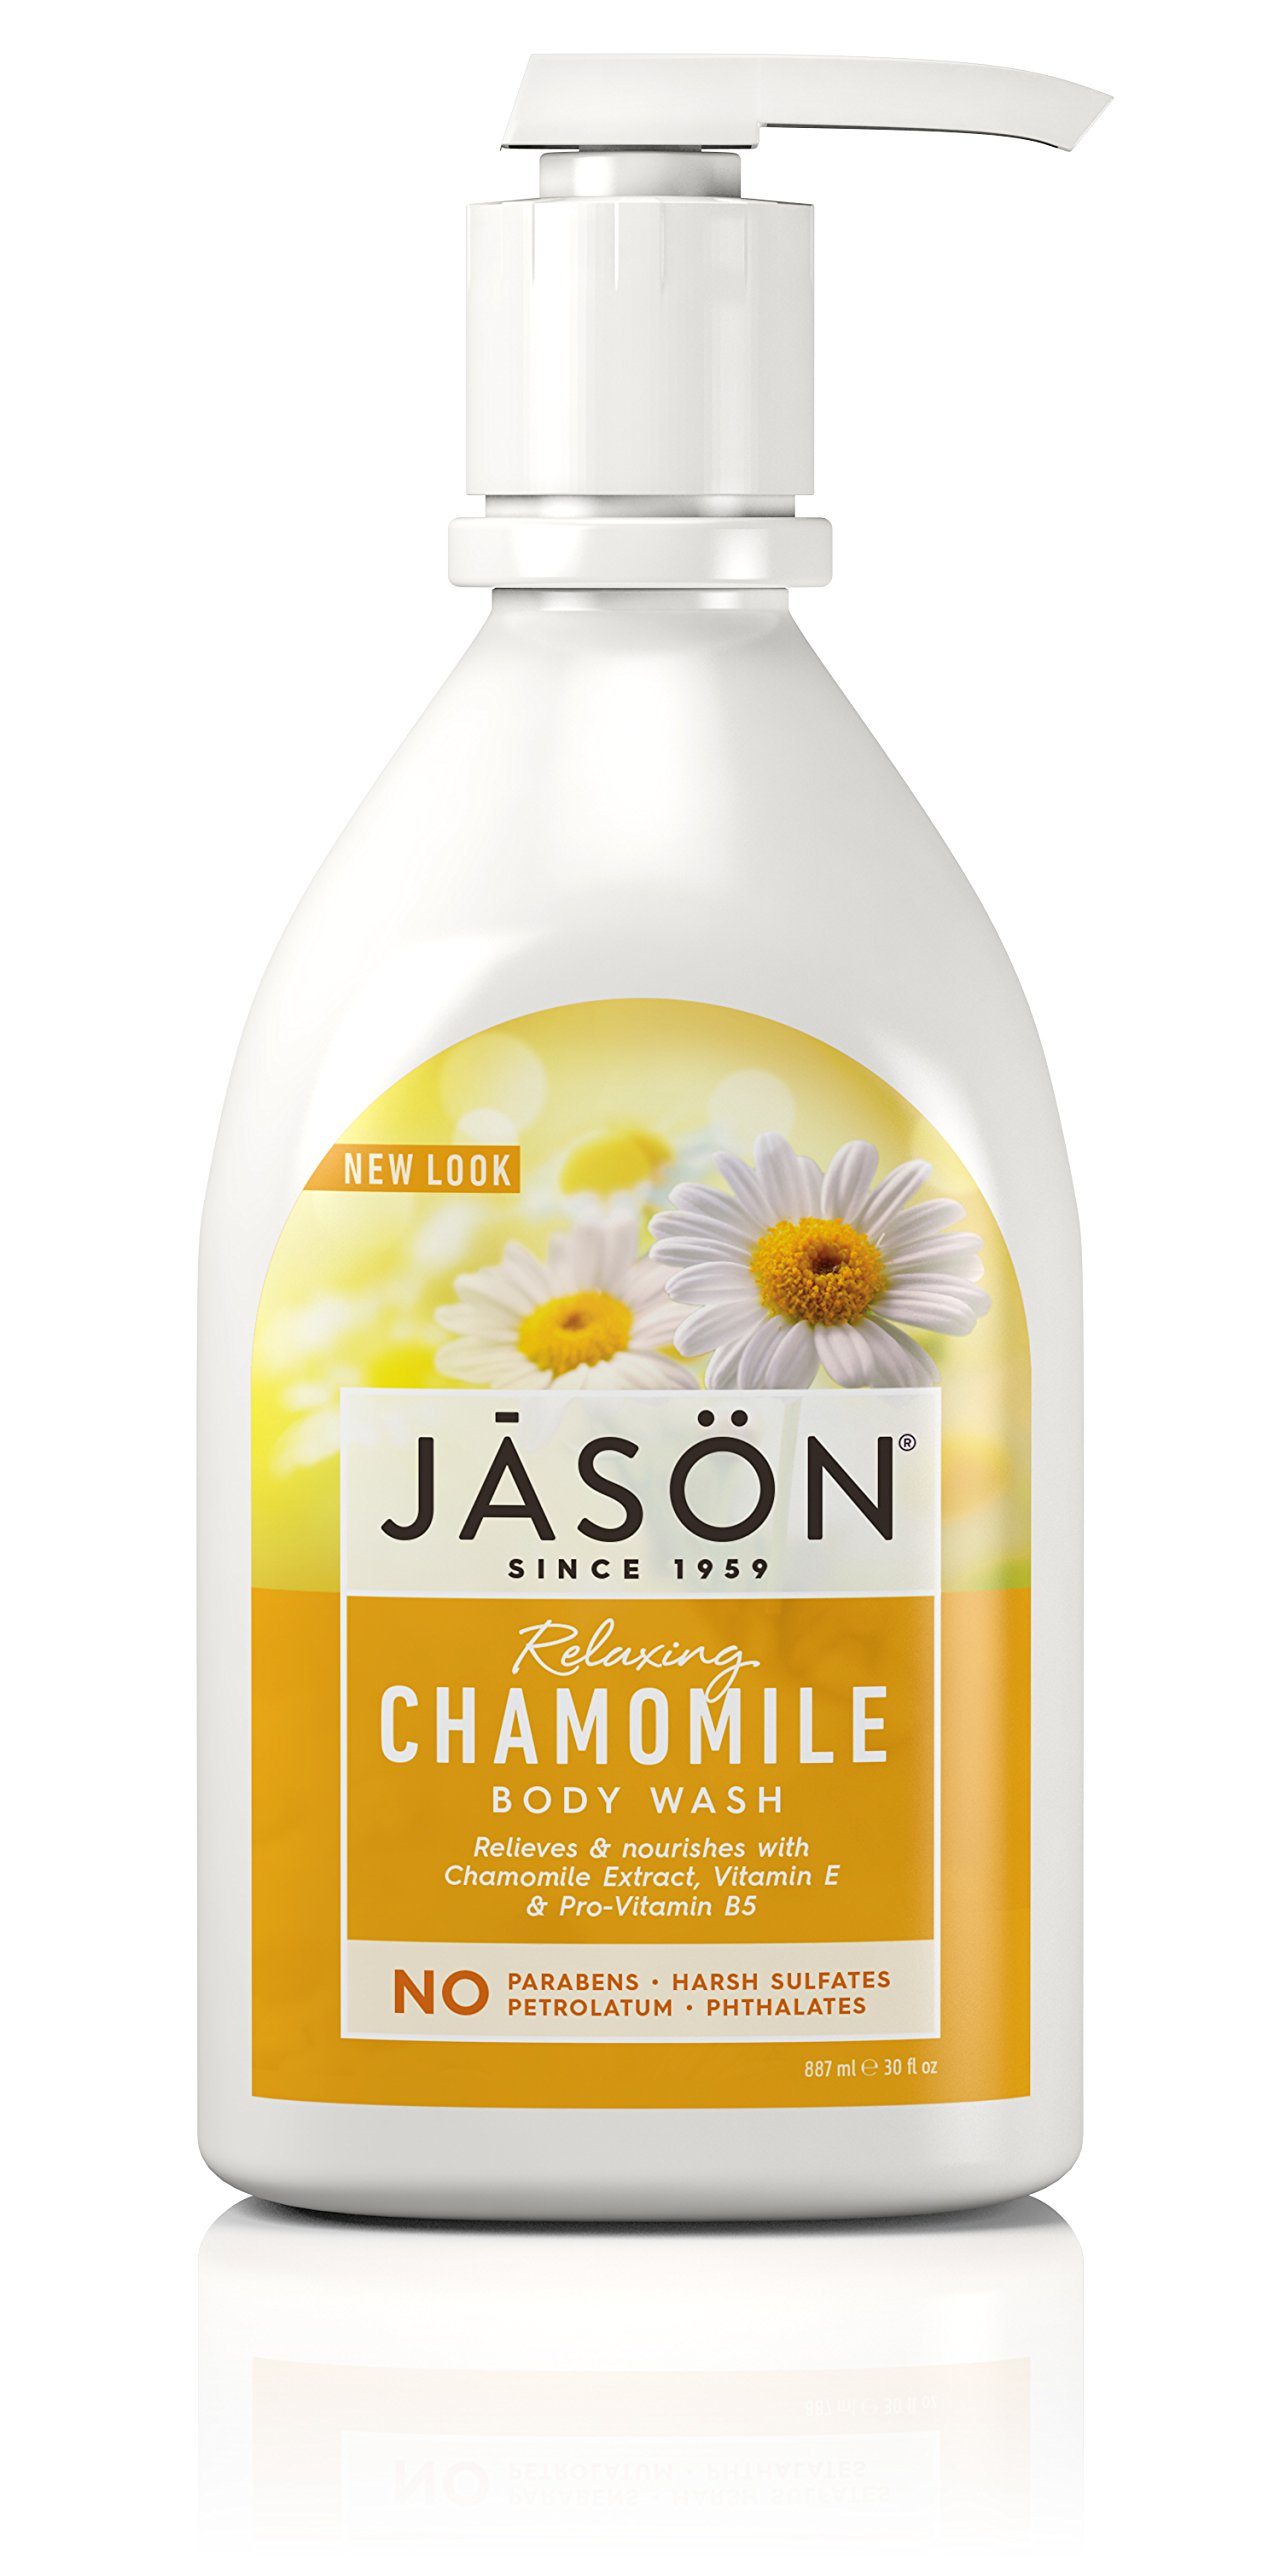 Jason 30 oz Relaxing Chamomile Pure Natural Body Wash